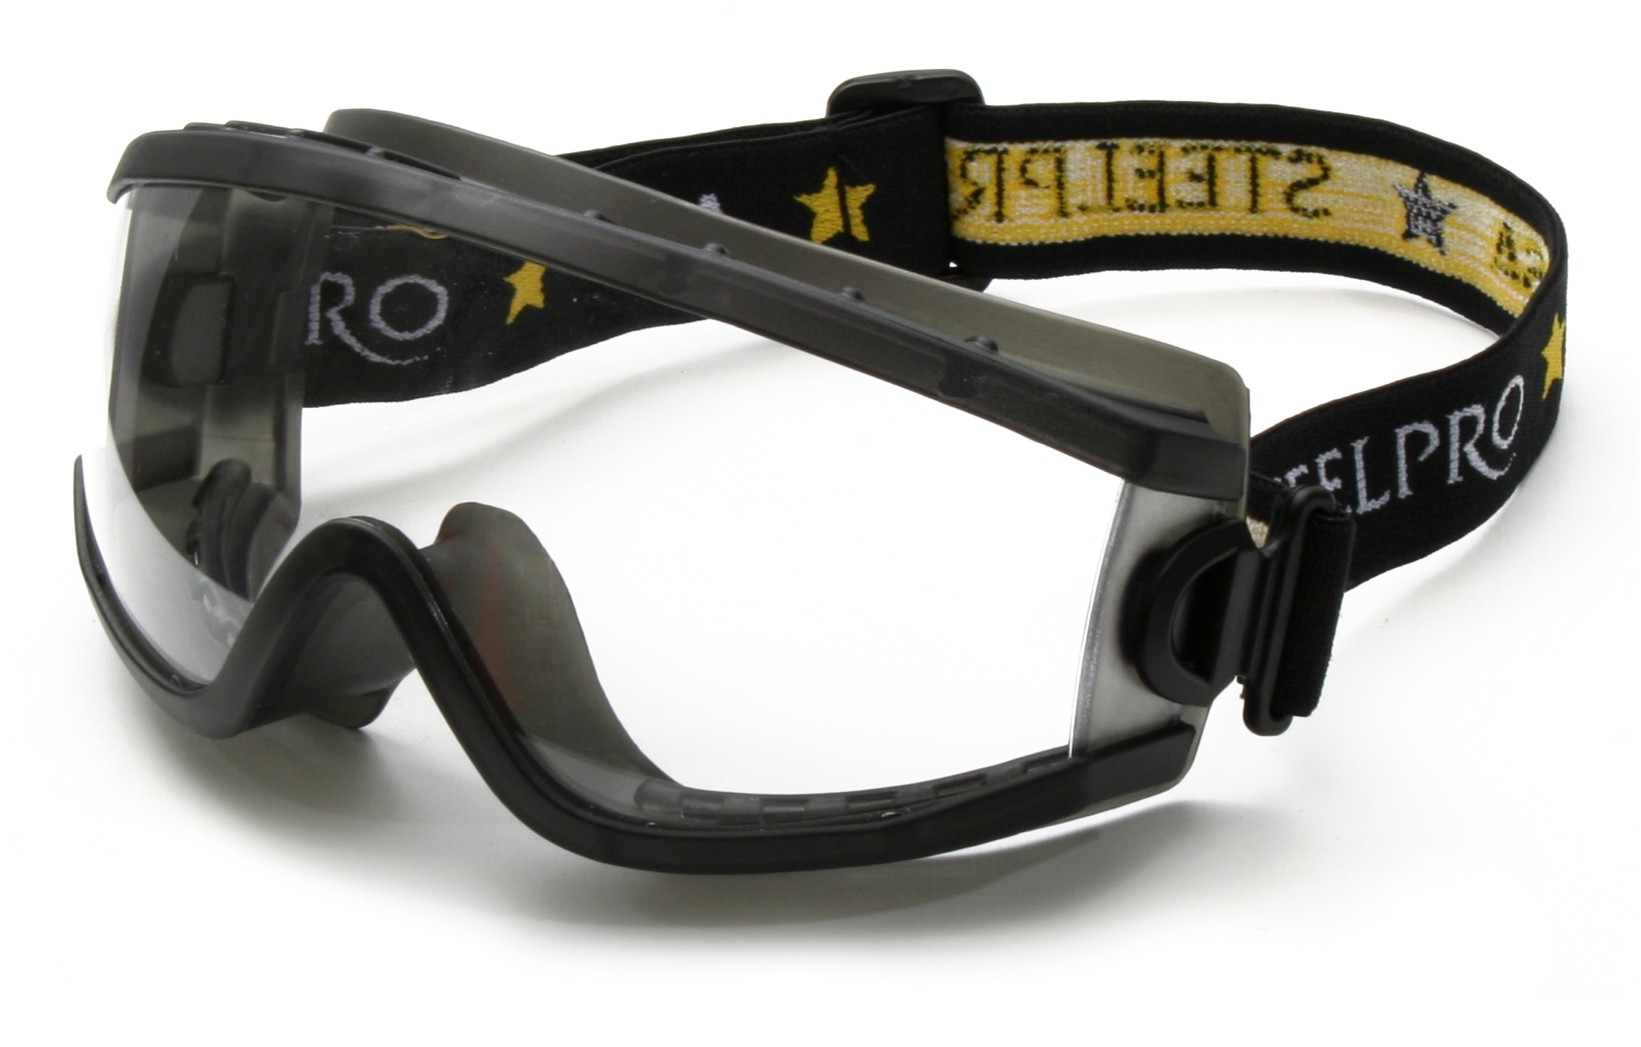 a345ed64f6582 Óculos incolor modelo Everest VIC56110   PROT-CAP